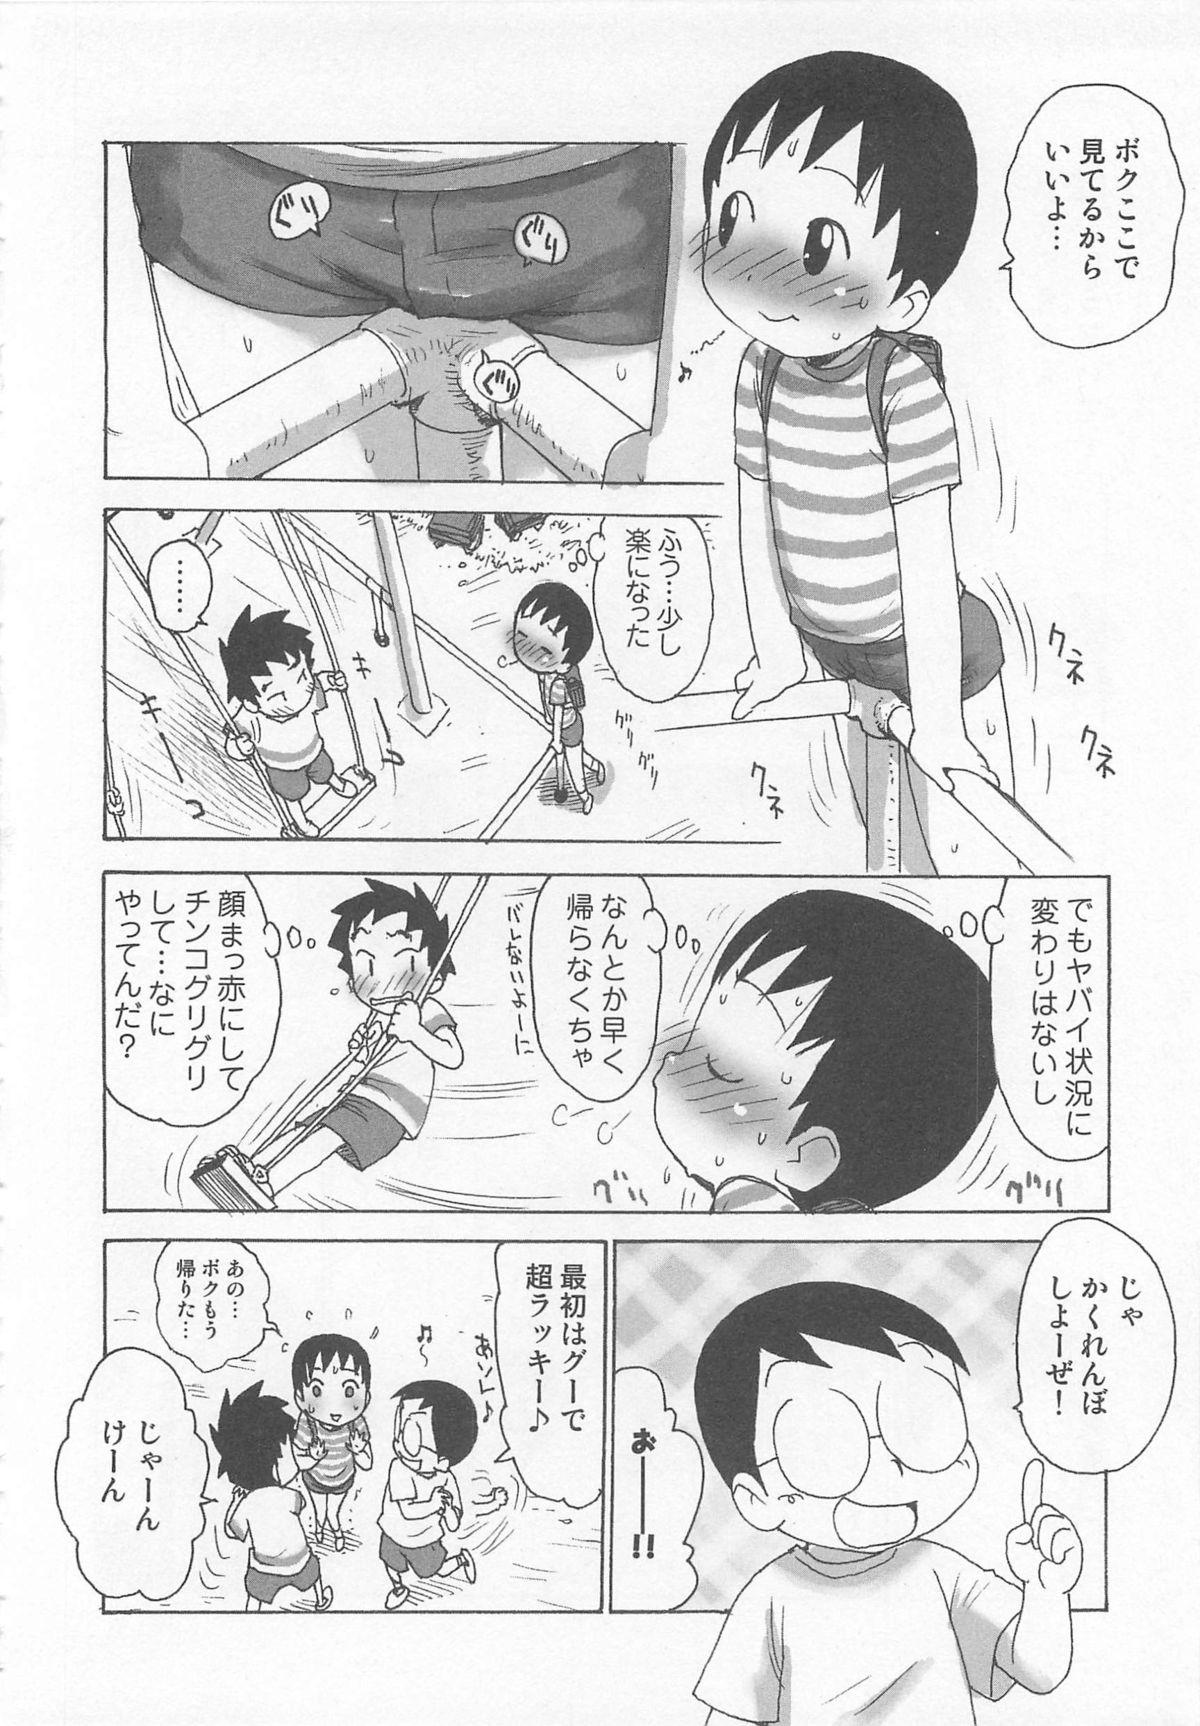 Otokonoko HEAVEN Vol. 02 Dokidoki Chikan Taiken 98